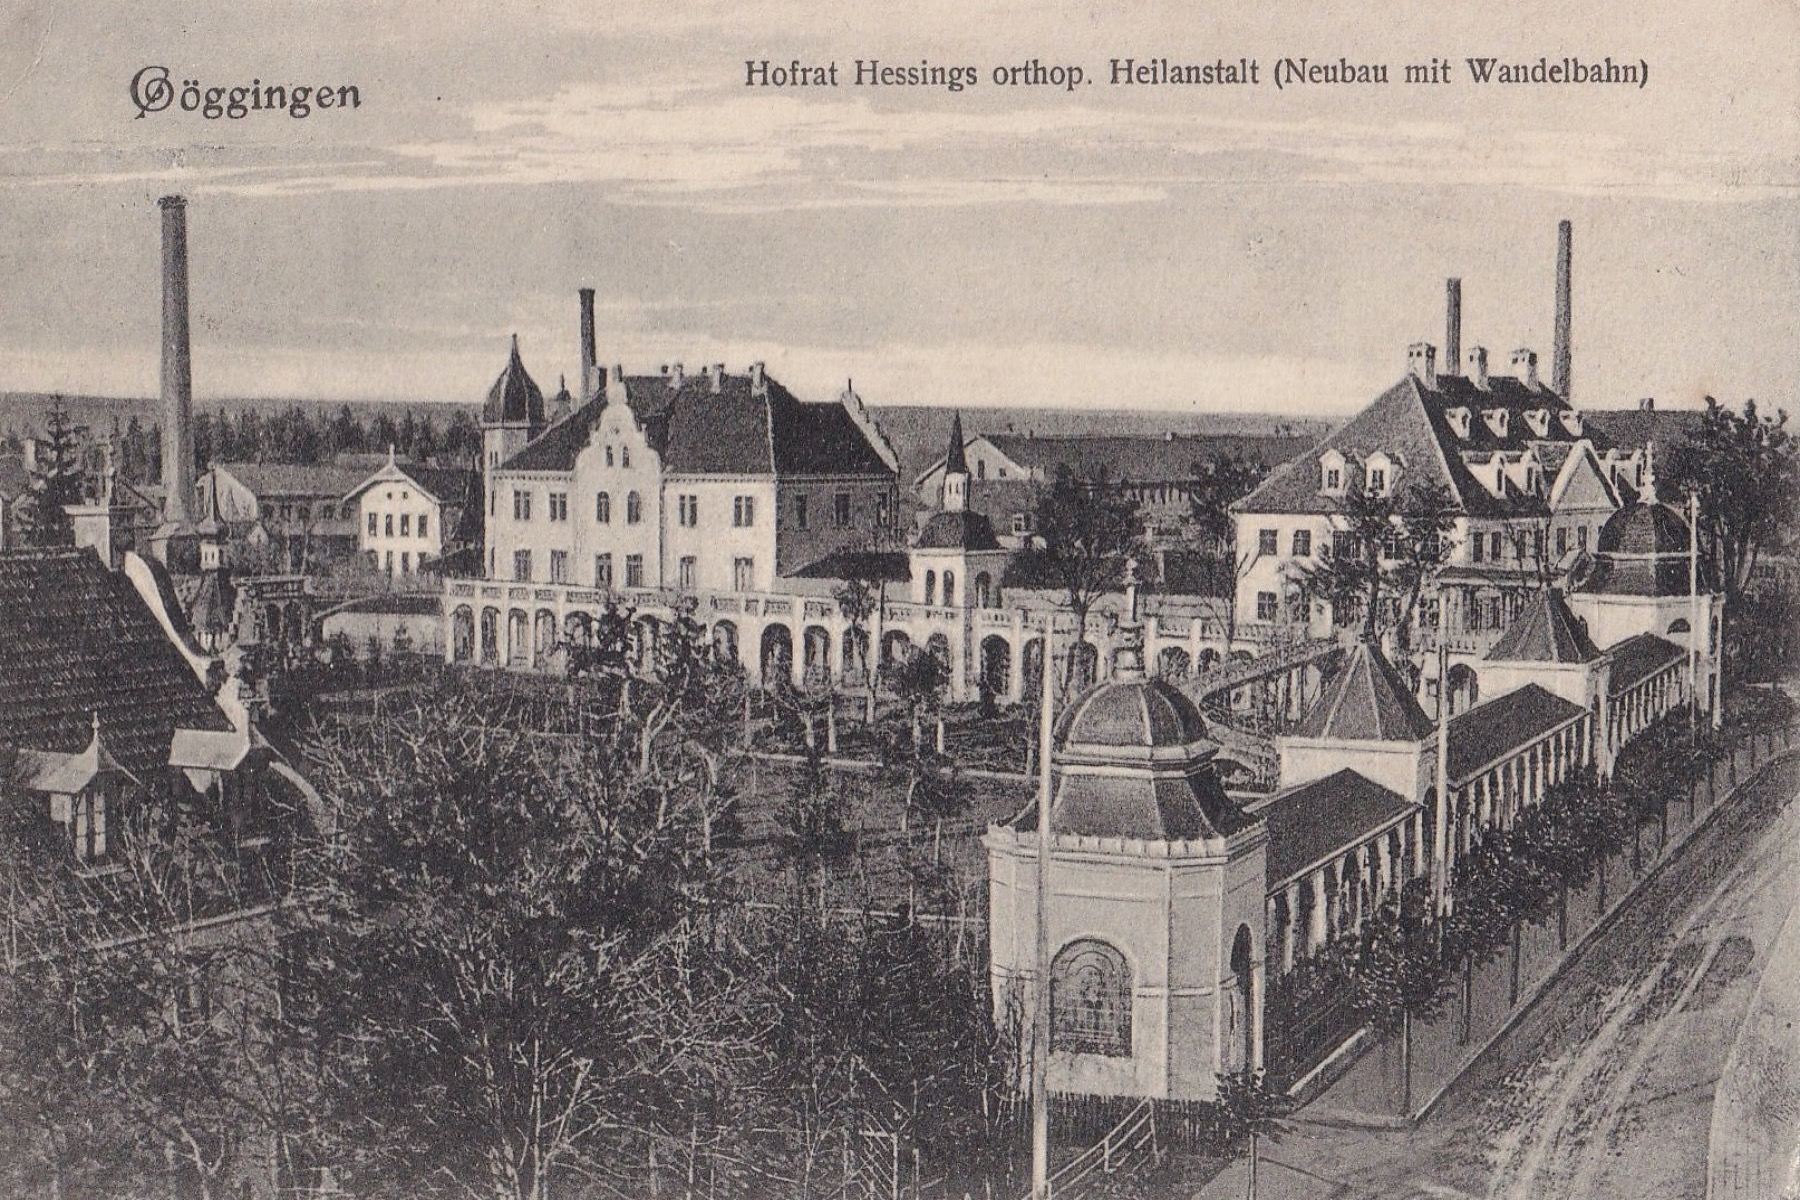 Hessing Klinik und Fabrikareal um 1900  – ©Privat Sammlung Gregor Nagler